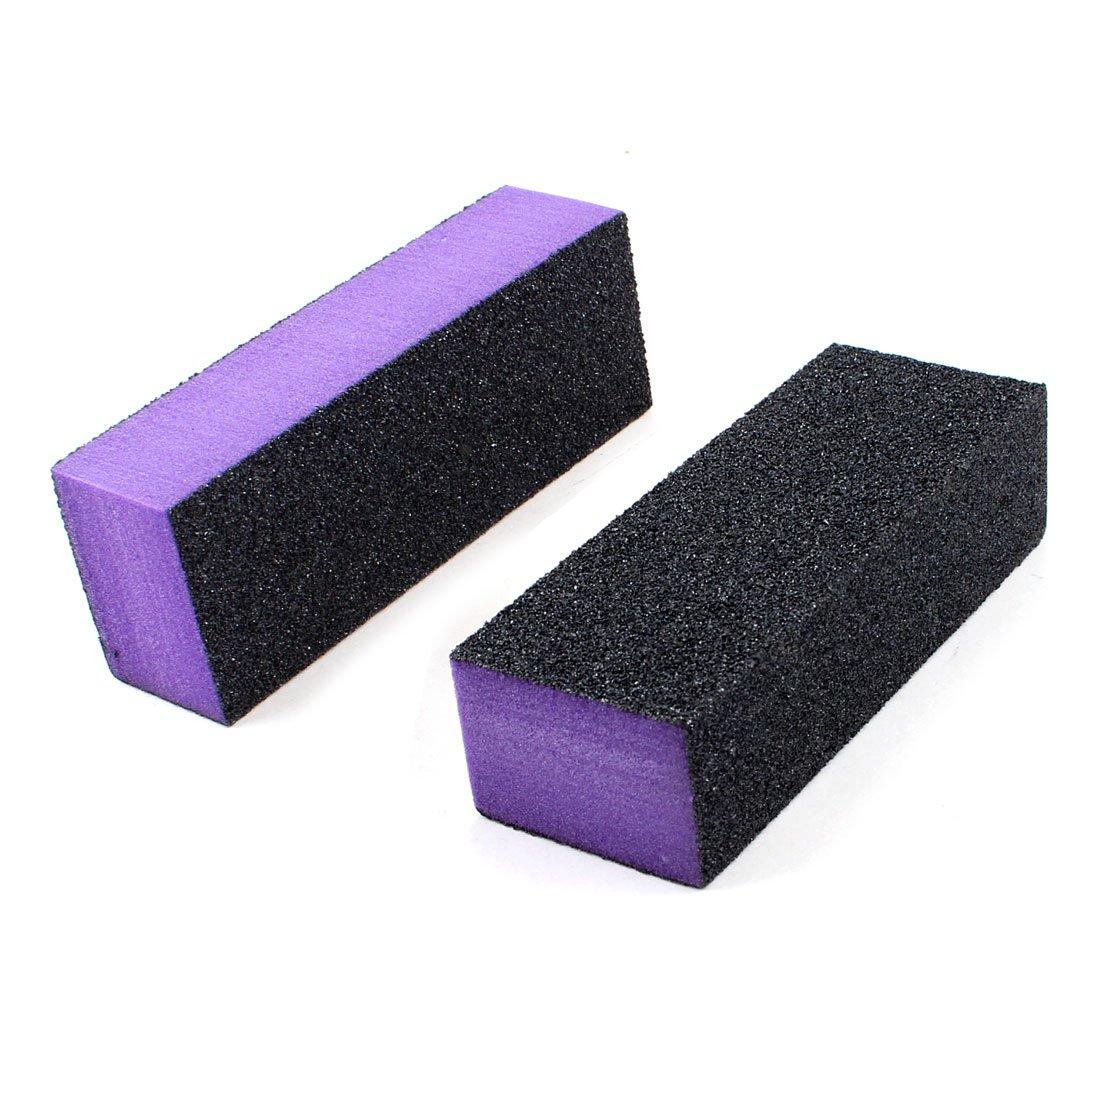 Black Purple 4 Way Nail File Art Shiner Nail Polish Buffer Buffing Block 2x(China (Mainland))